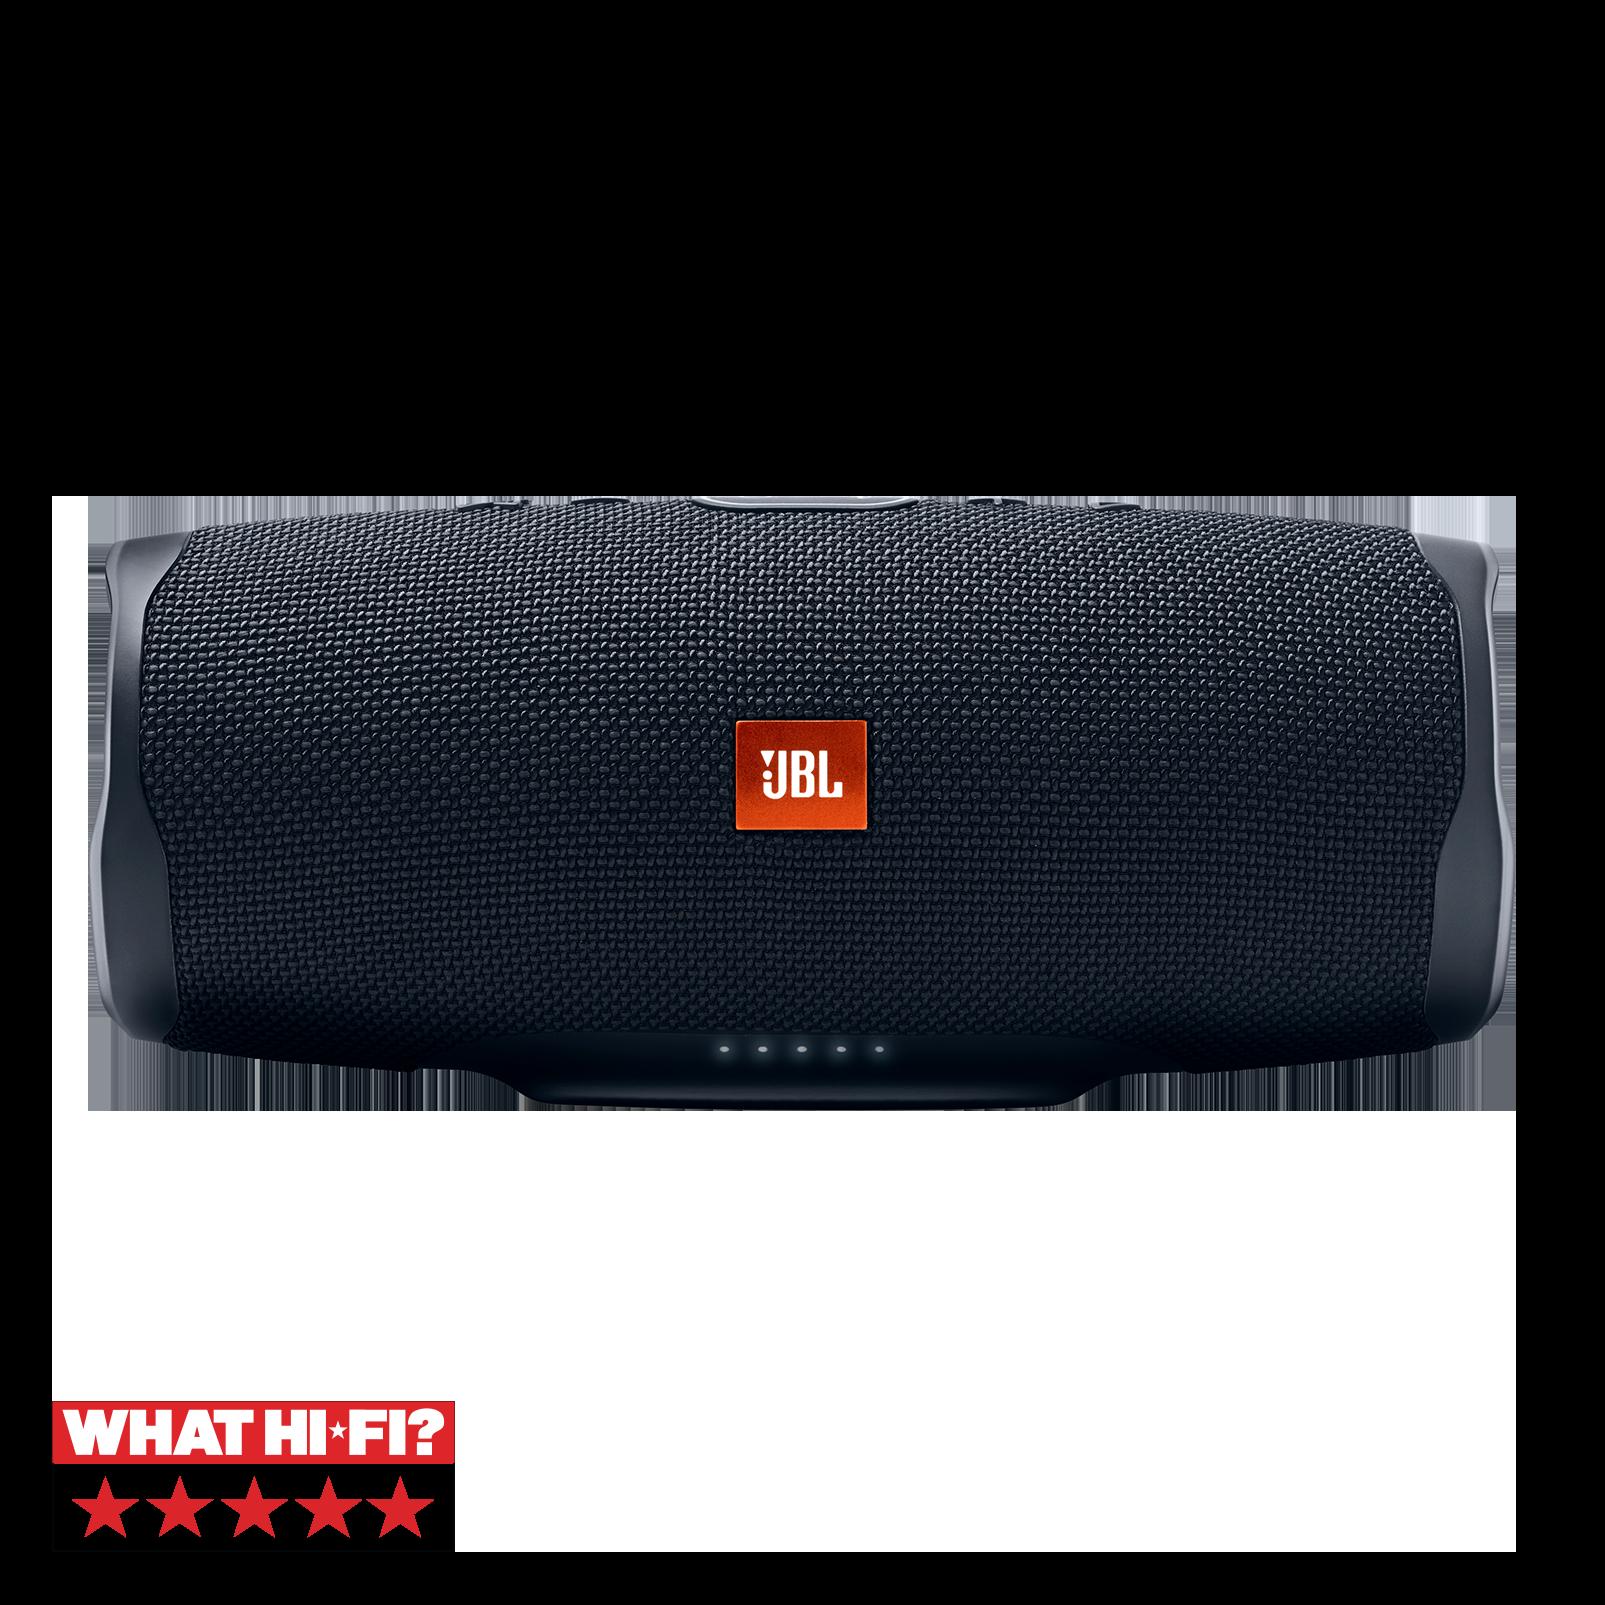 Jbl Bluetooth Speaker Flipkart Bluetooth 4 0 Ble Module Datasheet Bluetooth Thermal Printer India Bluetooth For Music In Car: Portable Bluetooth Speaker